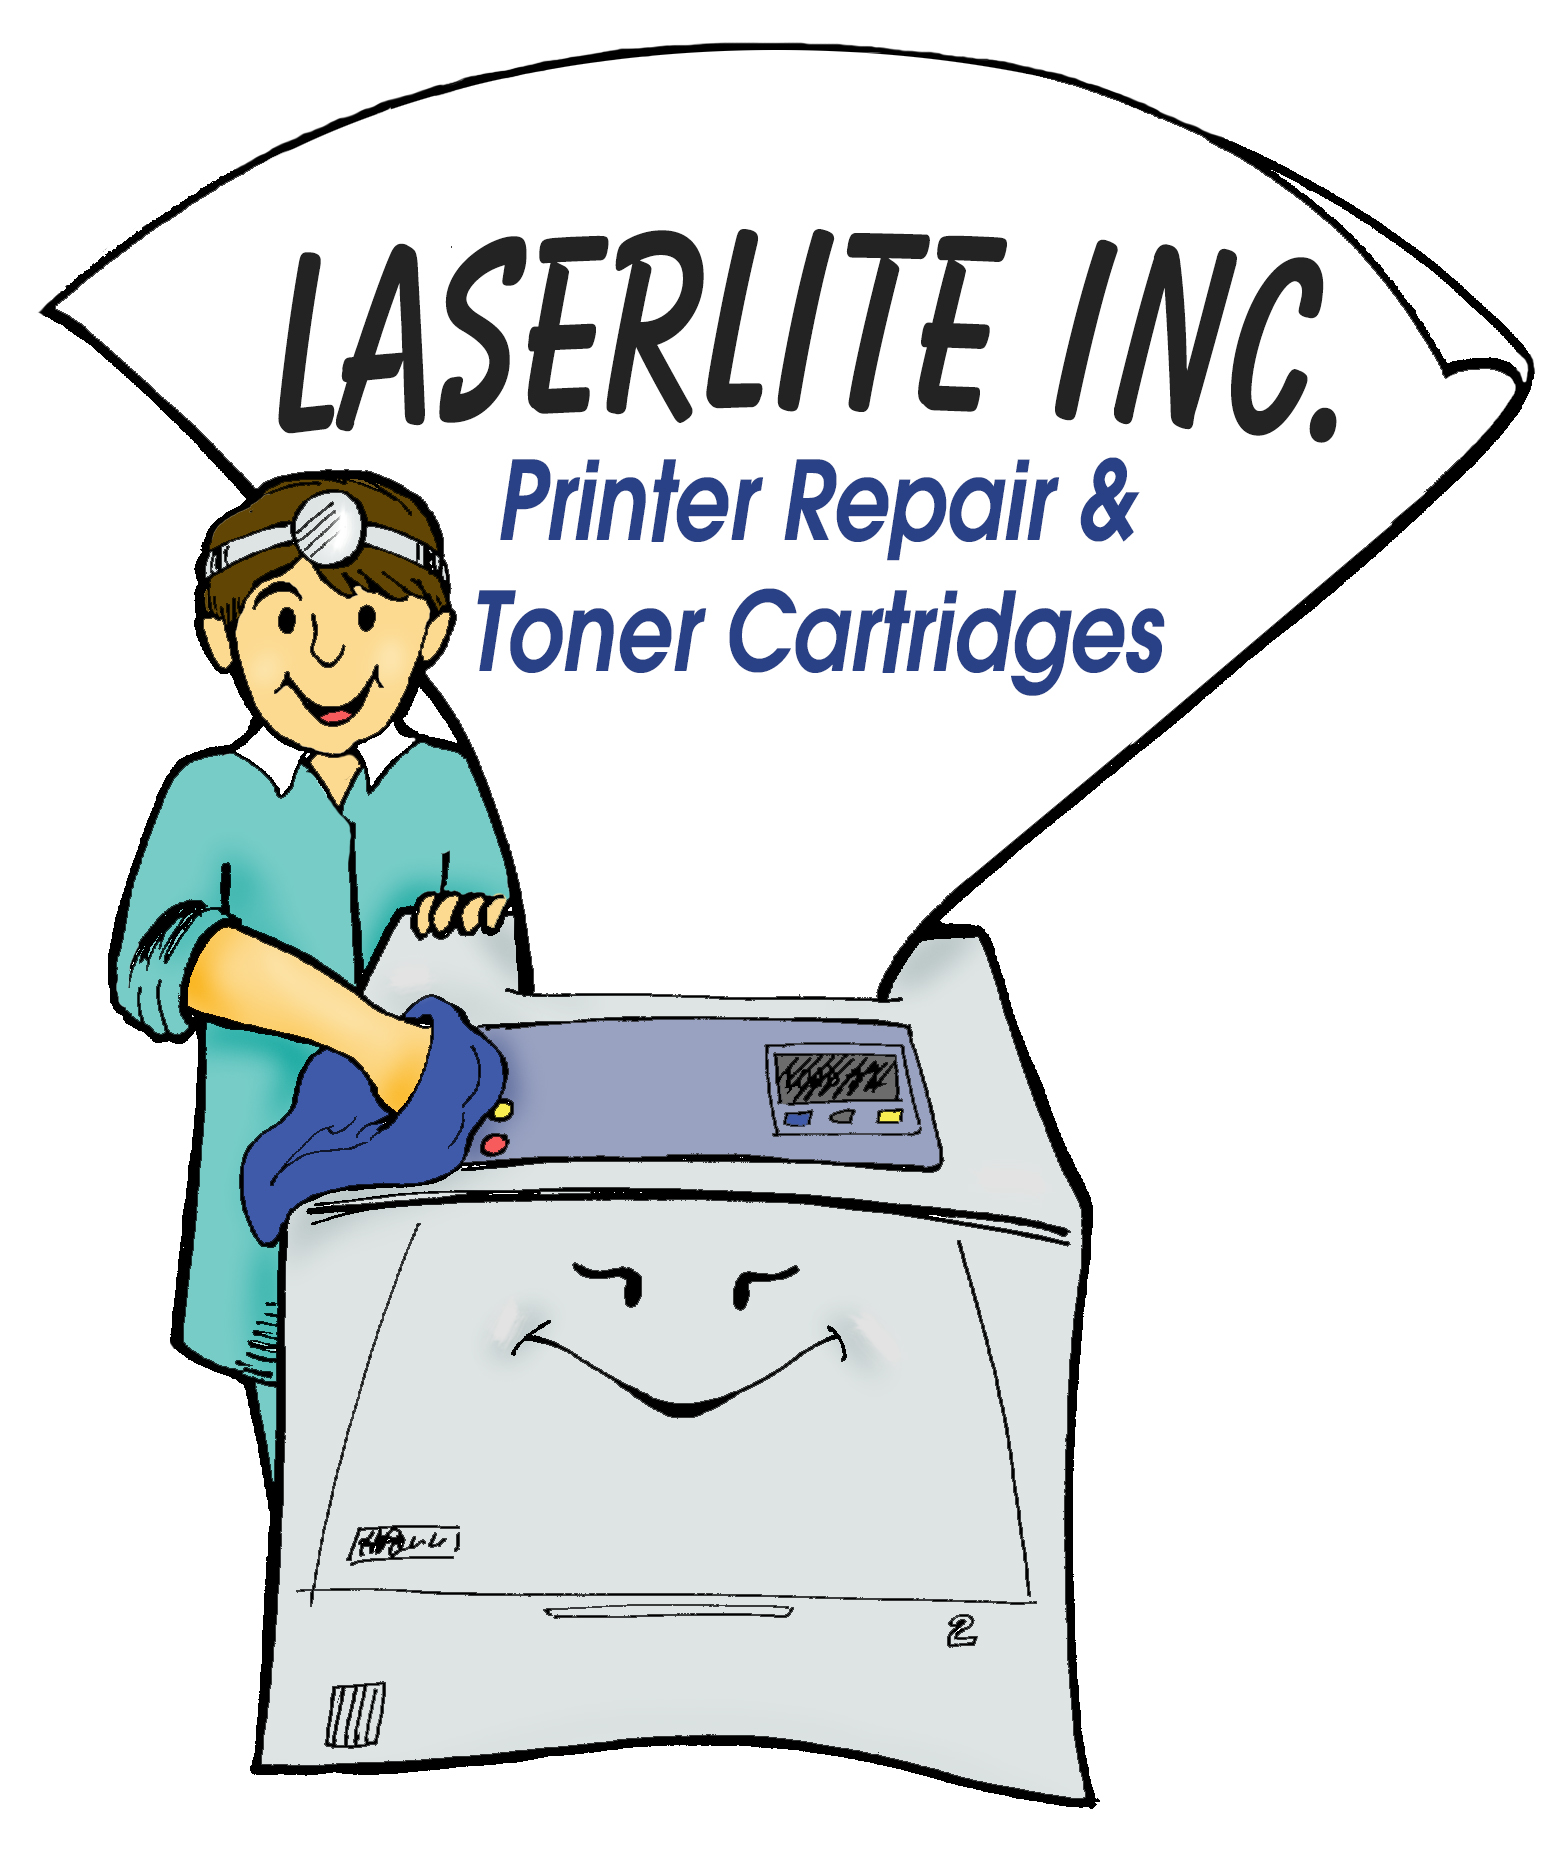 laserlite-inc-logo